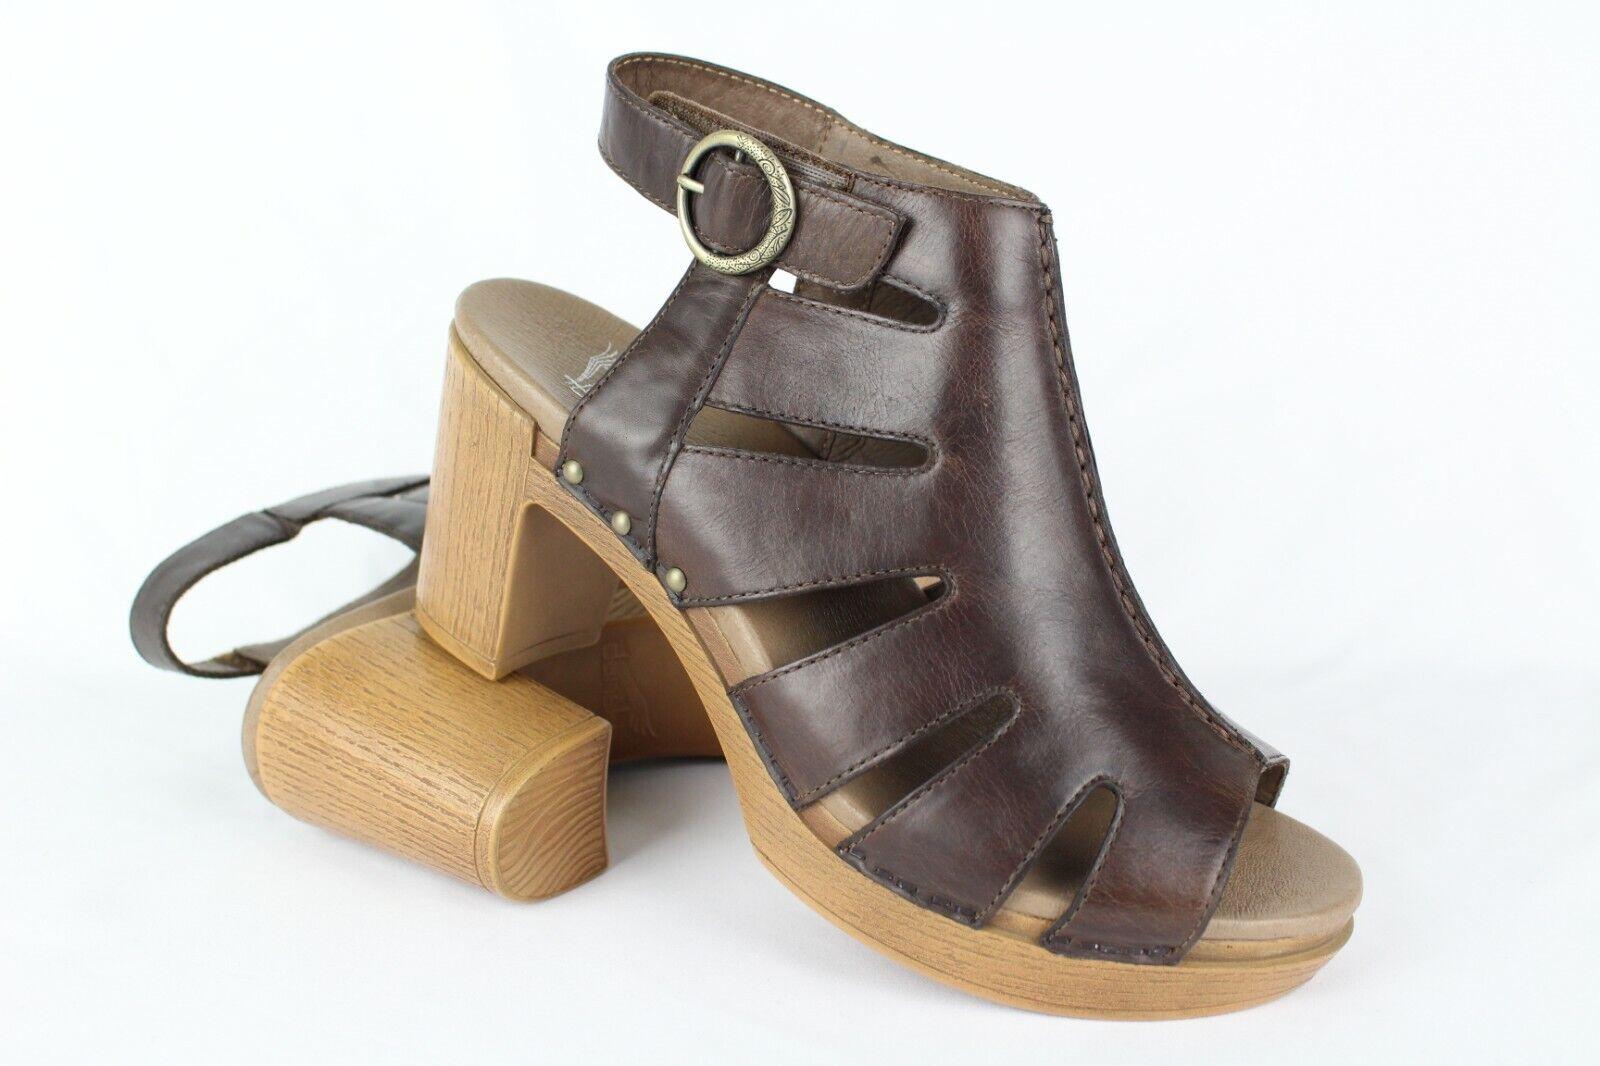 Dansko Women's Demetra Heeled Sandals Size 41 10.5-11 Taupe 3104671400